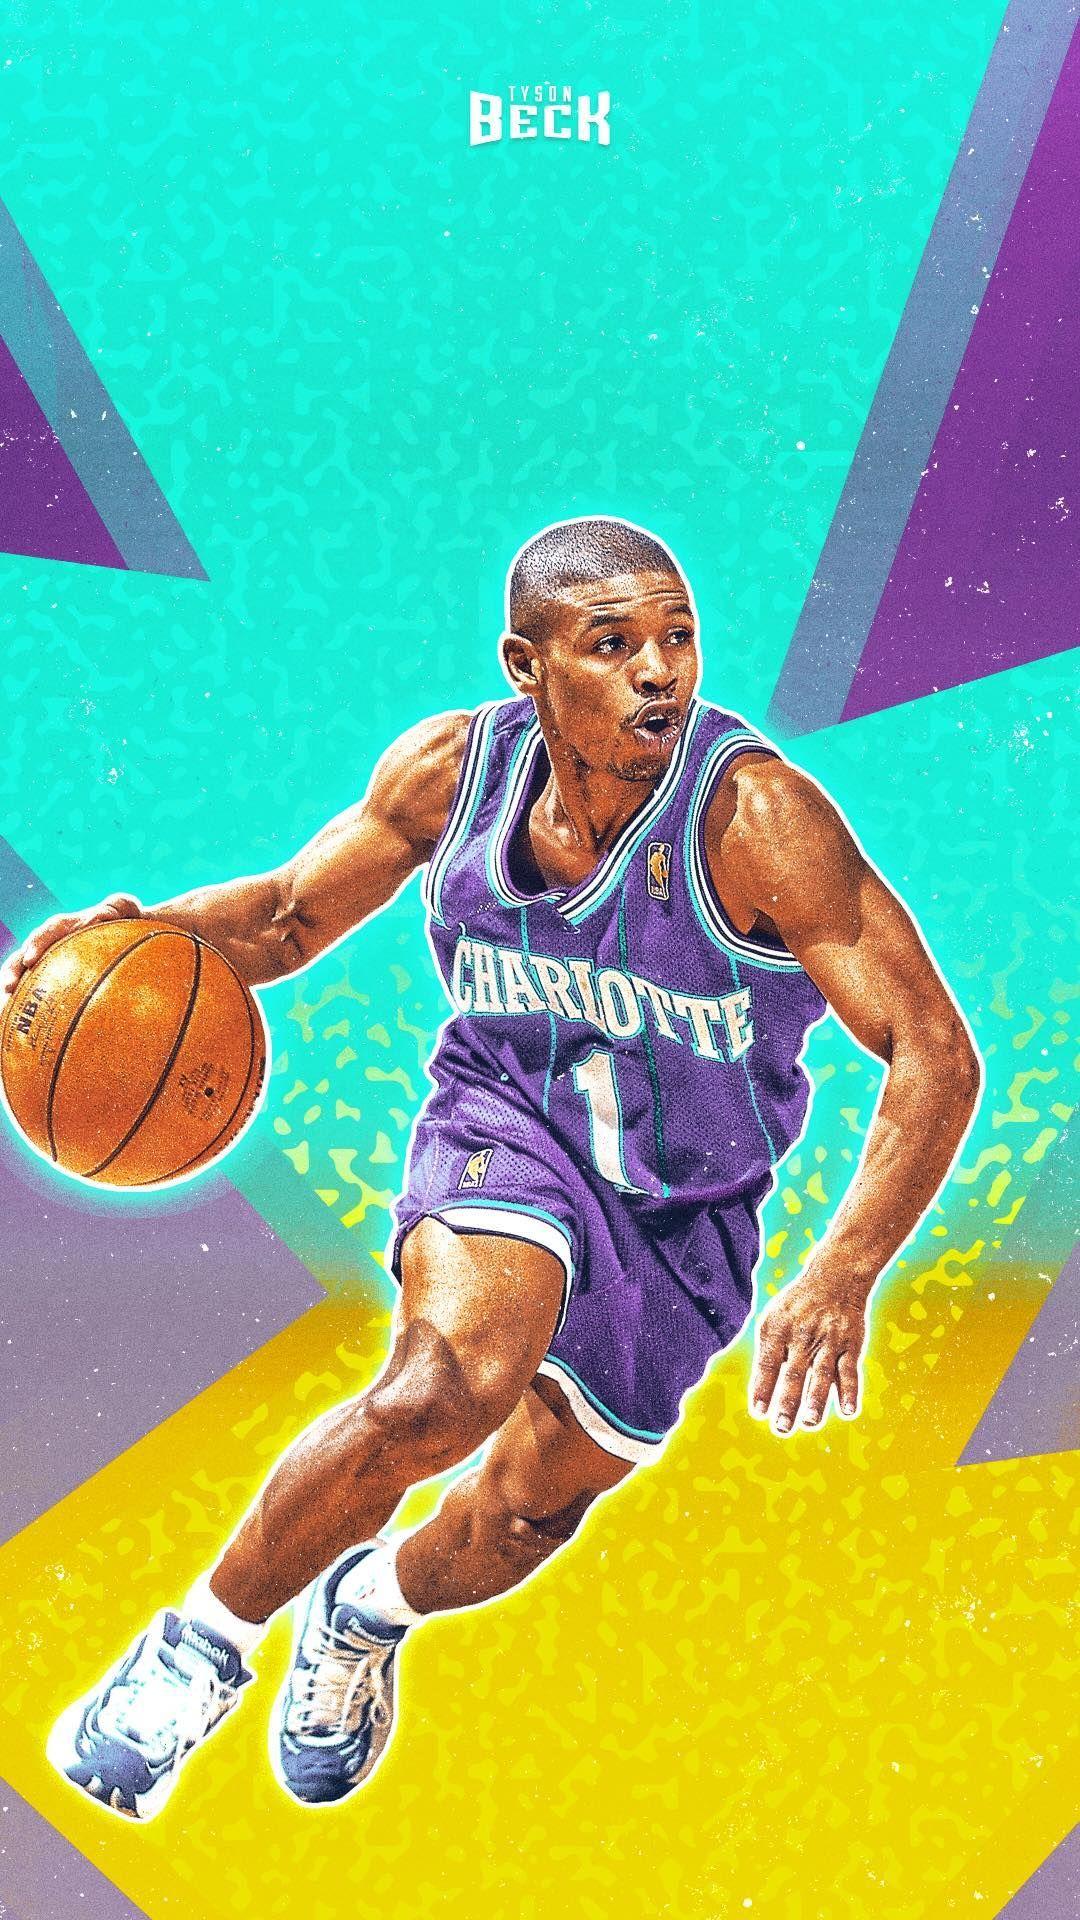 Cerita Instagram In 2020 Best Nba Players Basketball Legends Nba Wallpapers